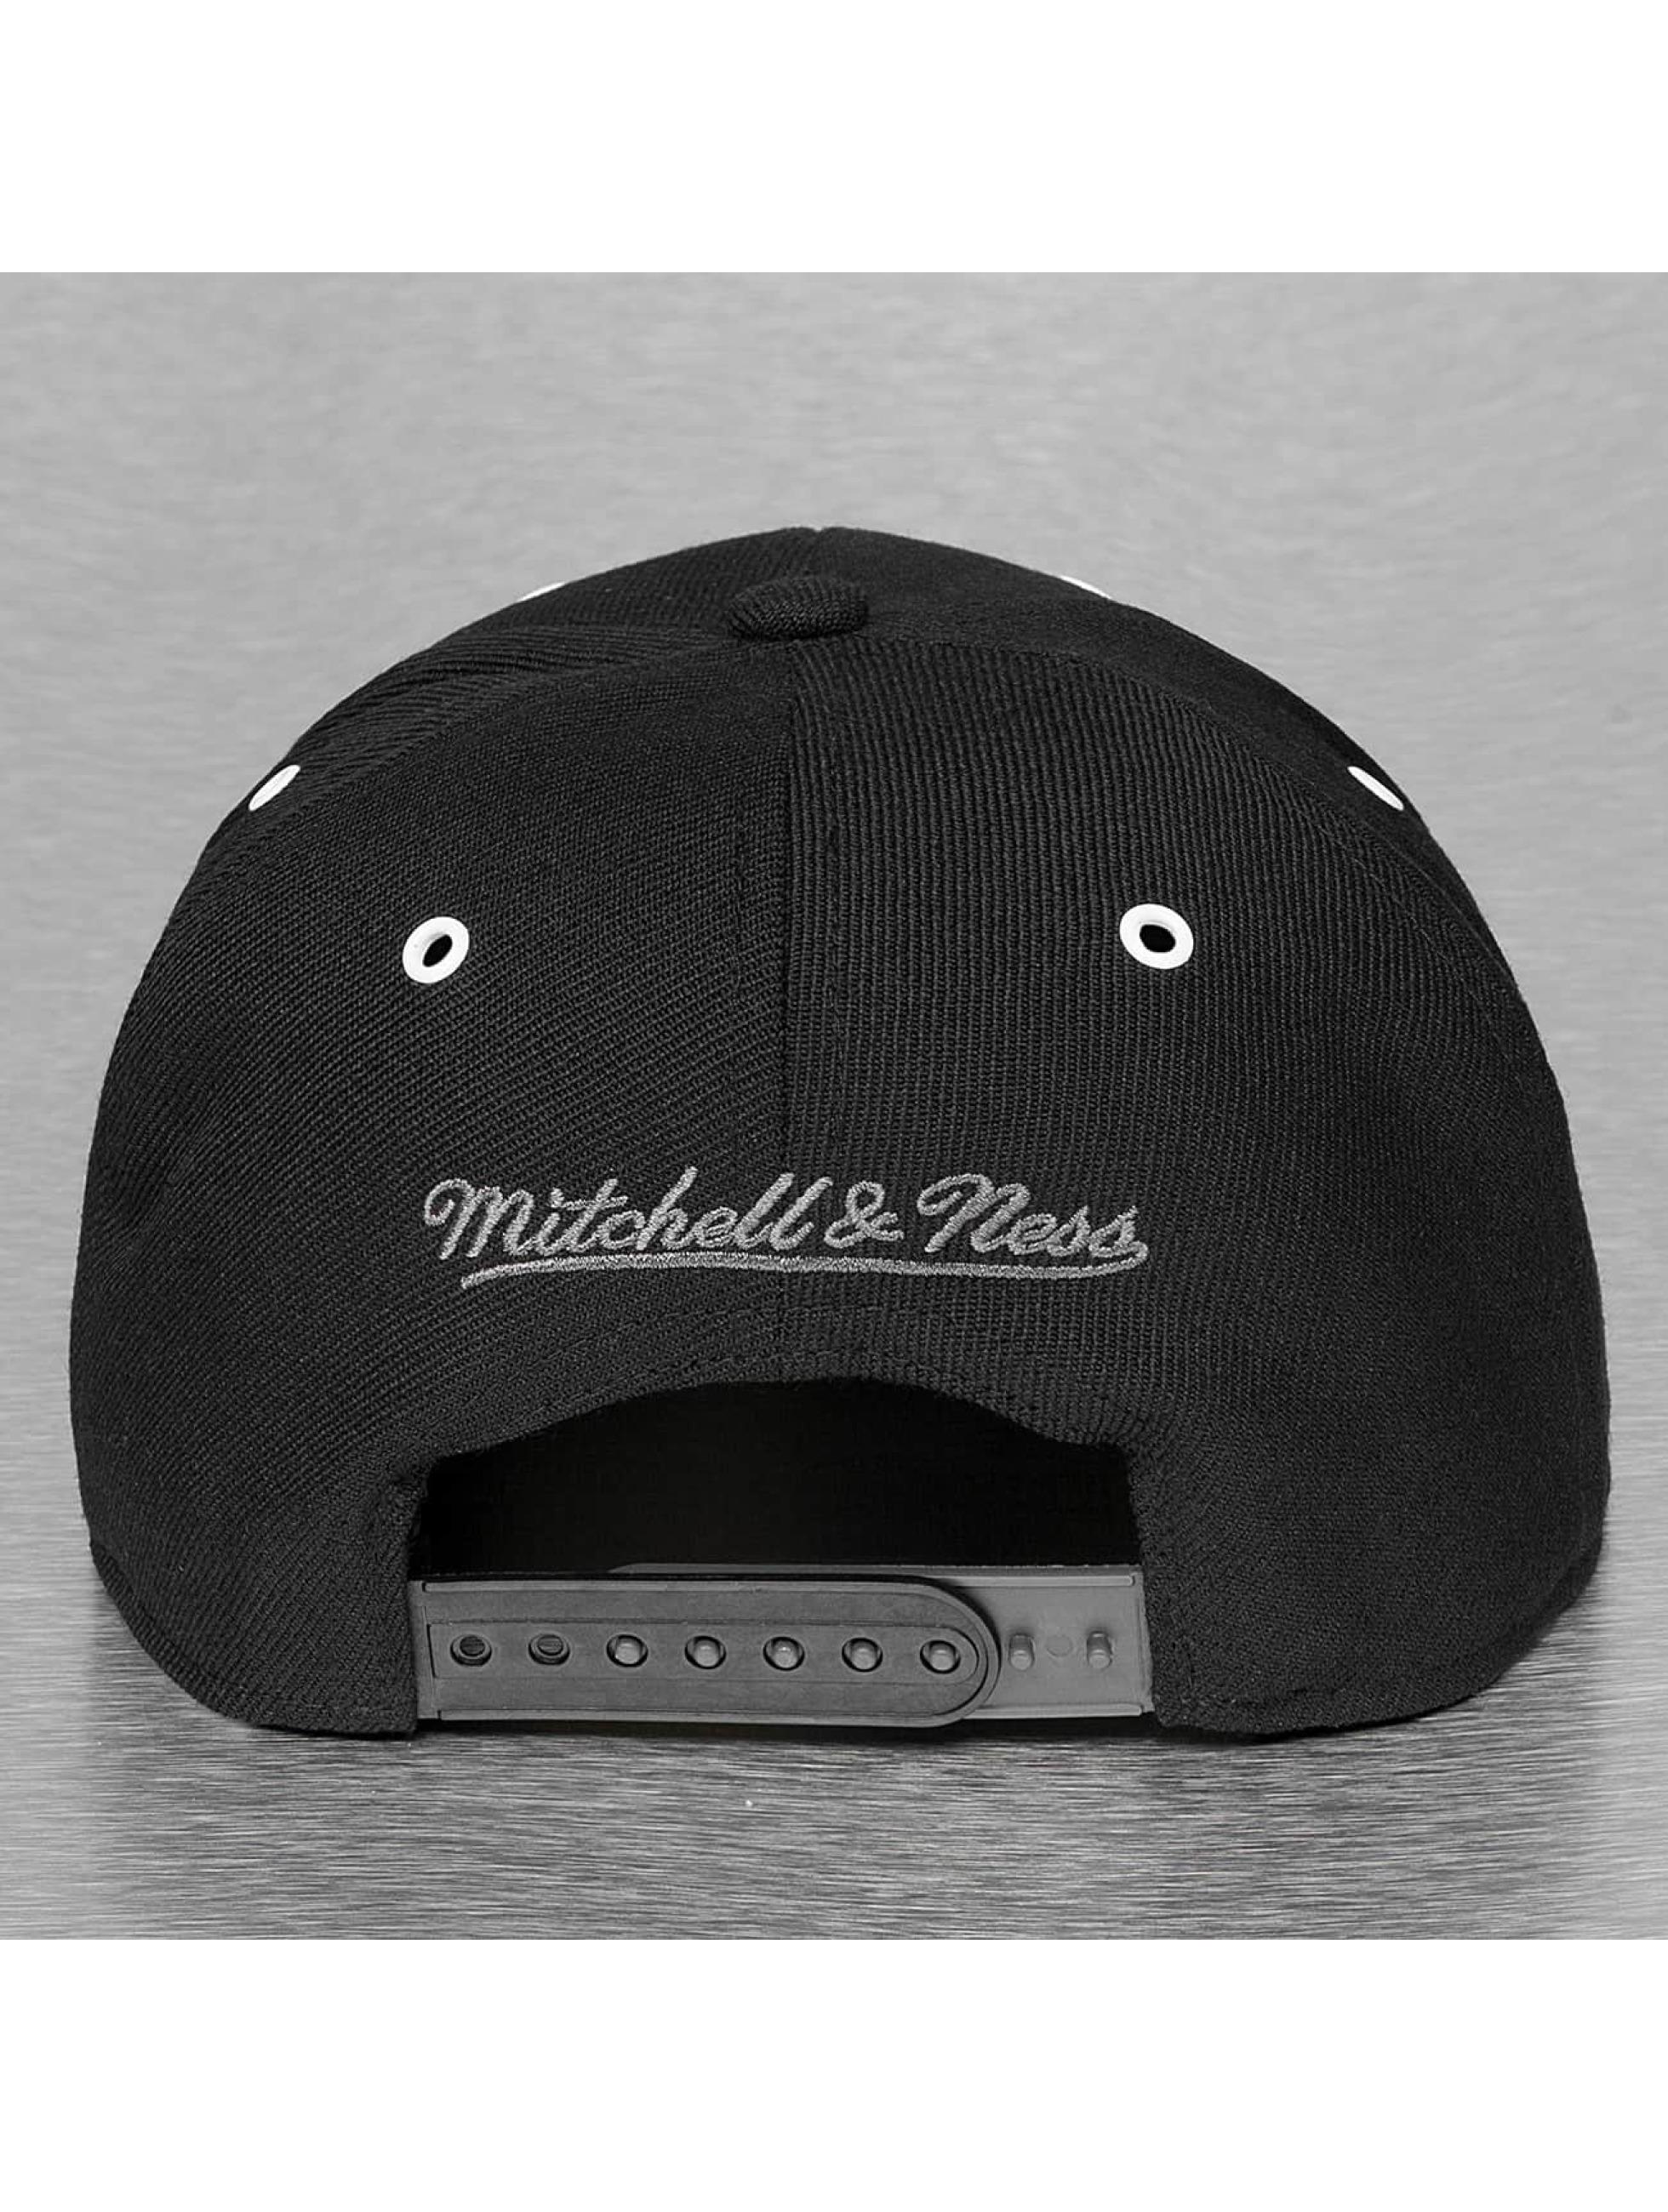 Mitchell & Ness Casquette Snapback & Strapback BGW2 noir